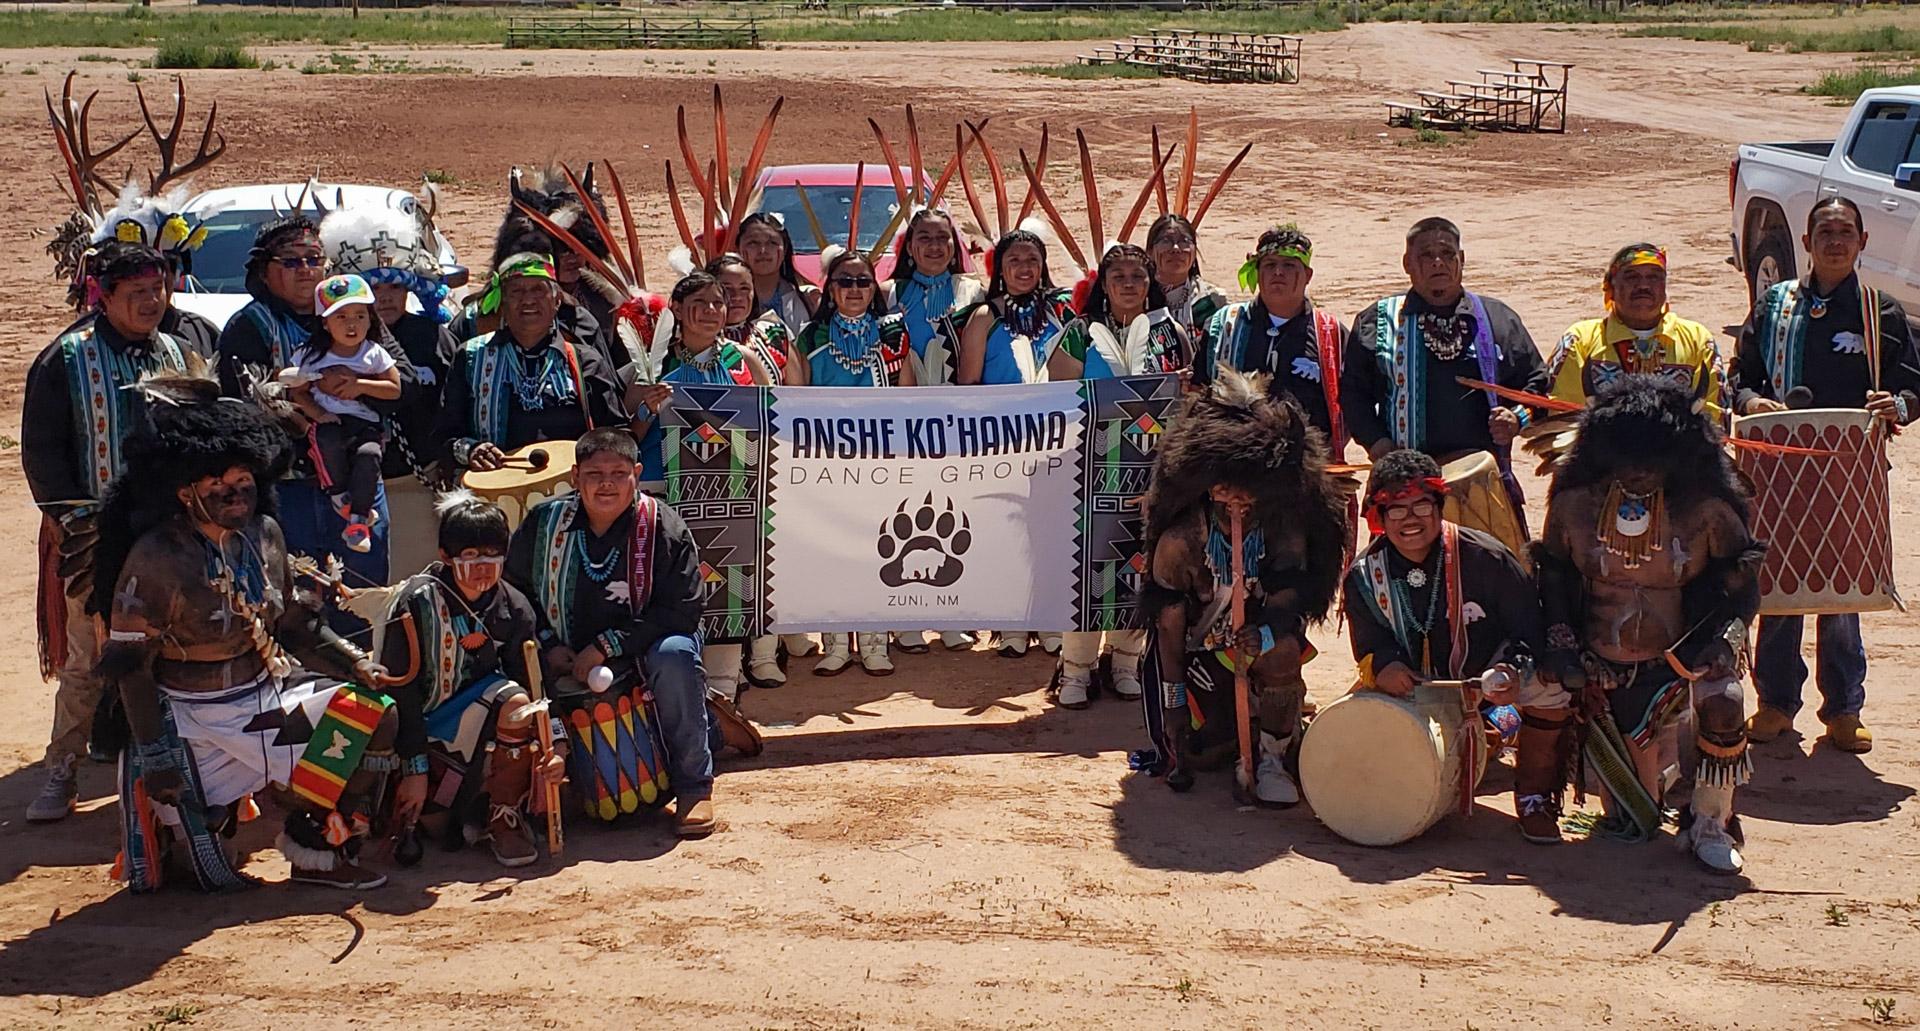 Anshe Ko'hanna Dance Group (Zuni) Balloon Fiesta at the Indian Pueblo Cultural Center